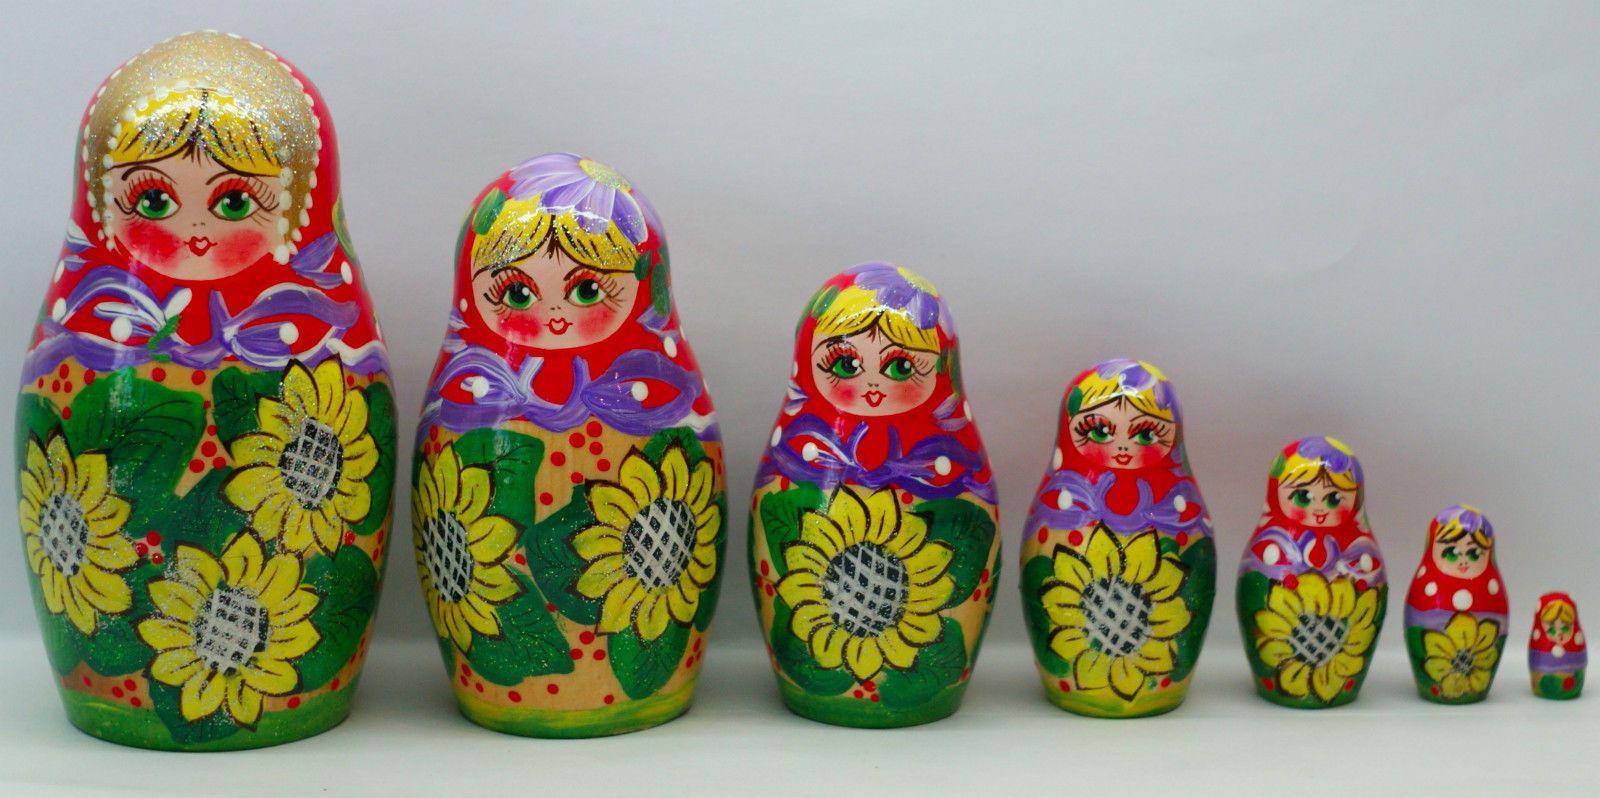 Doll toys images  Russian Nesting Dolls Toy Sunflower  Pcs Matryoshka  eBay